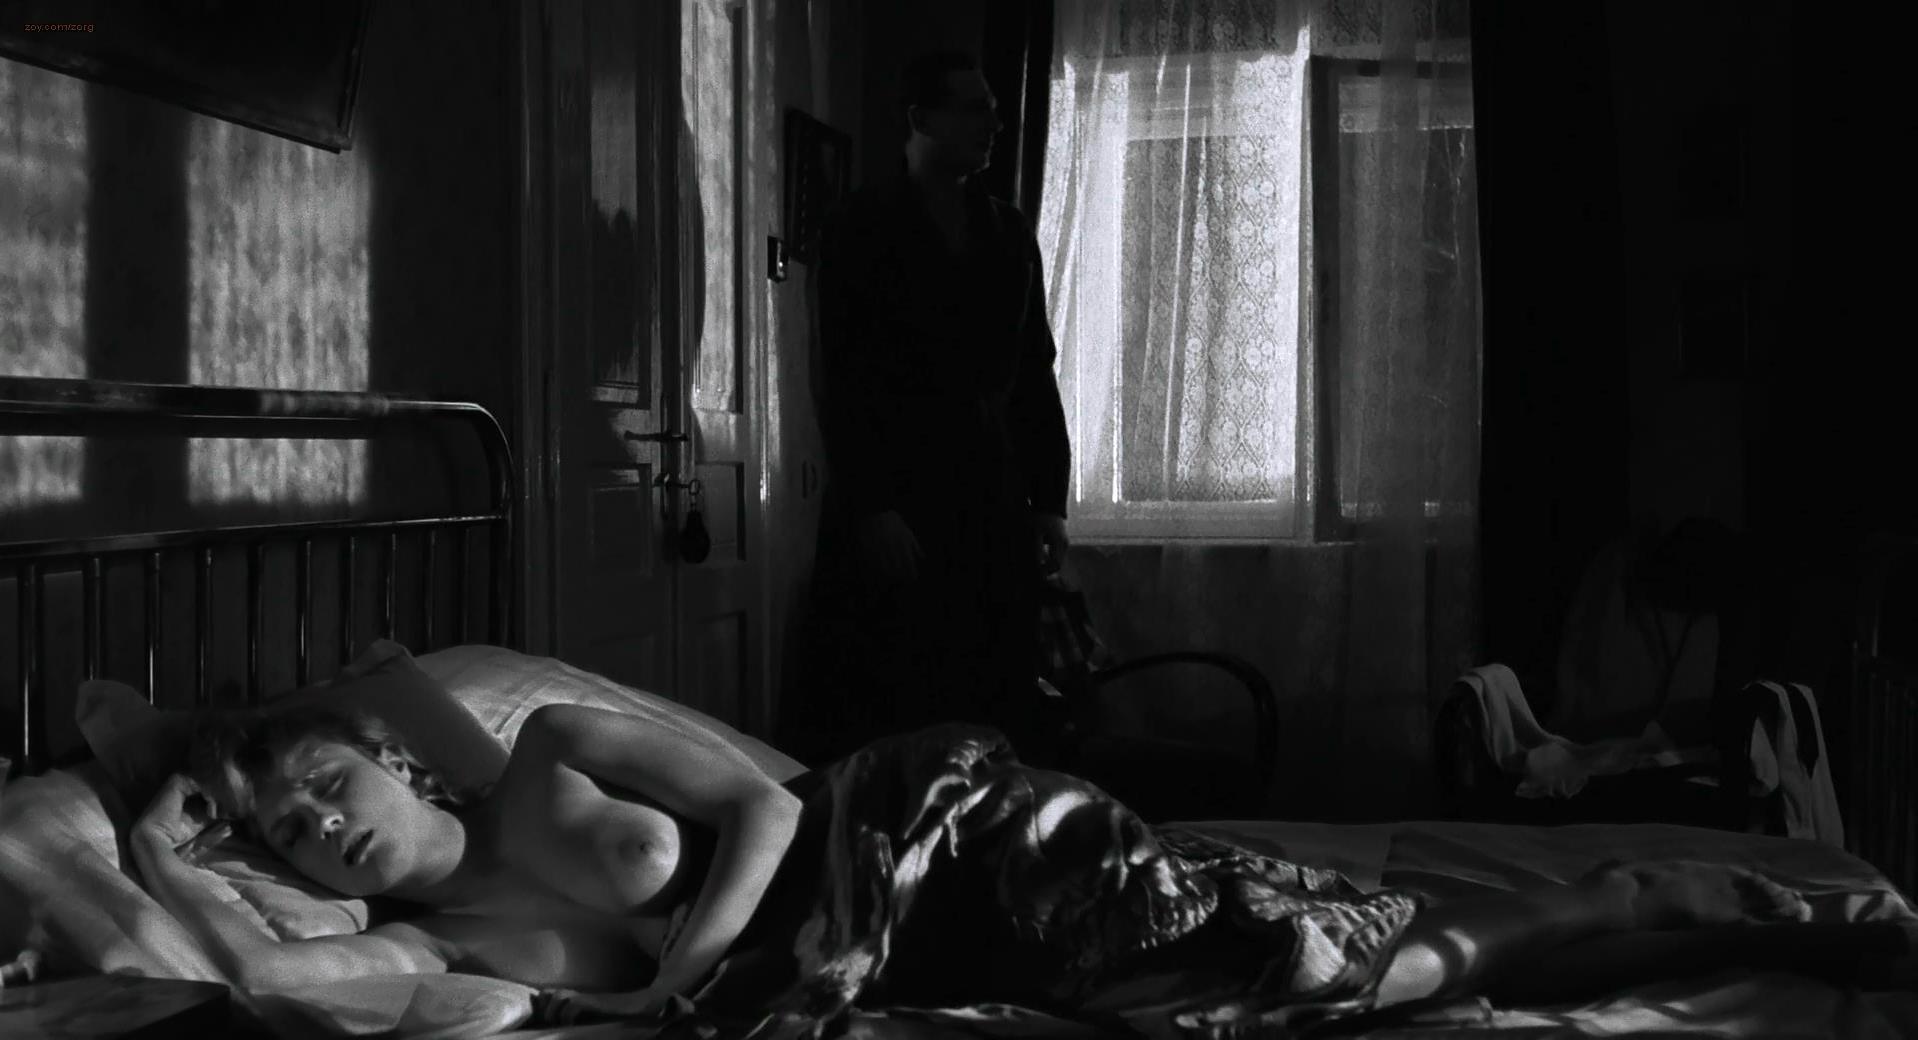 Nude Video Celebs Embeth Davidtz Nude Schindlers List 1993